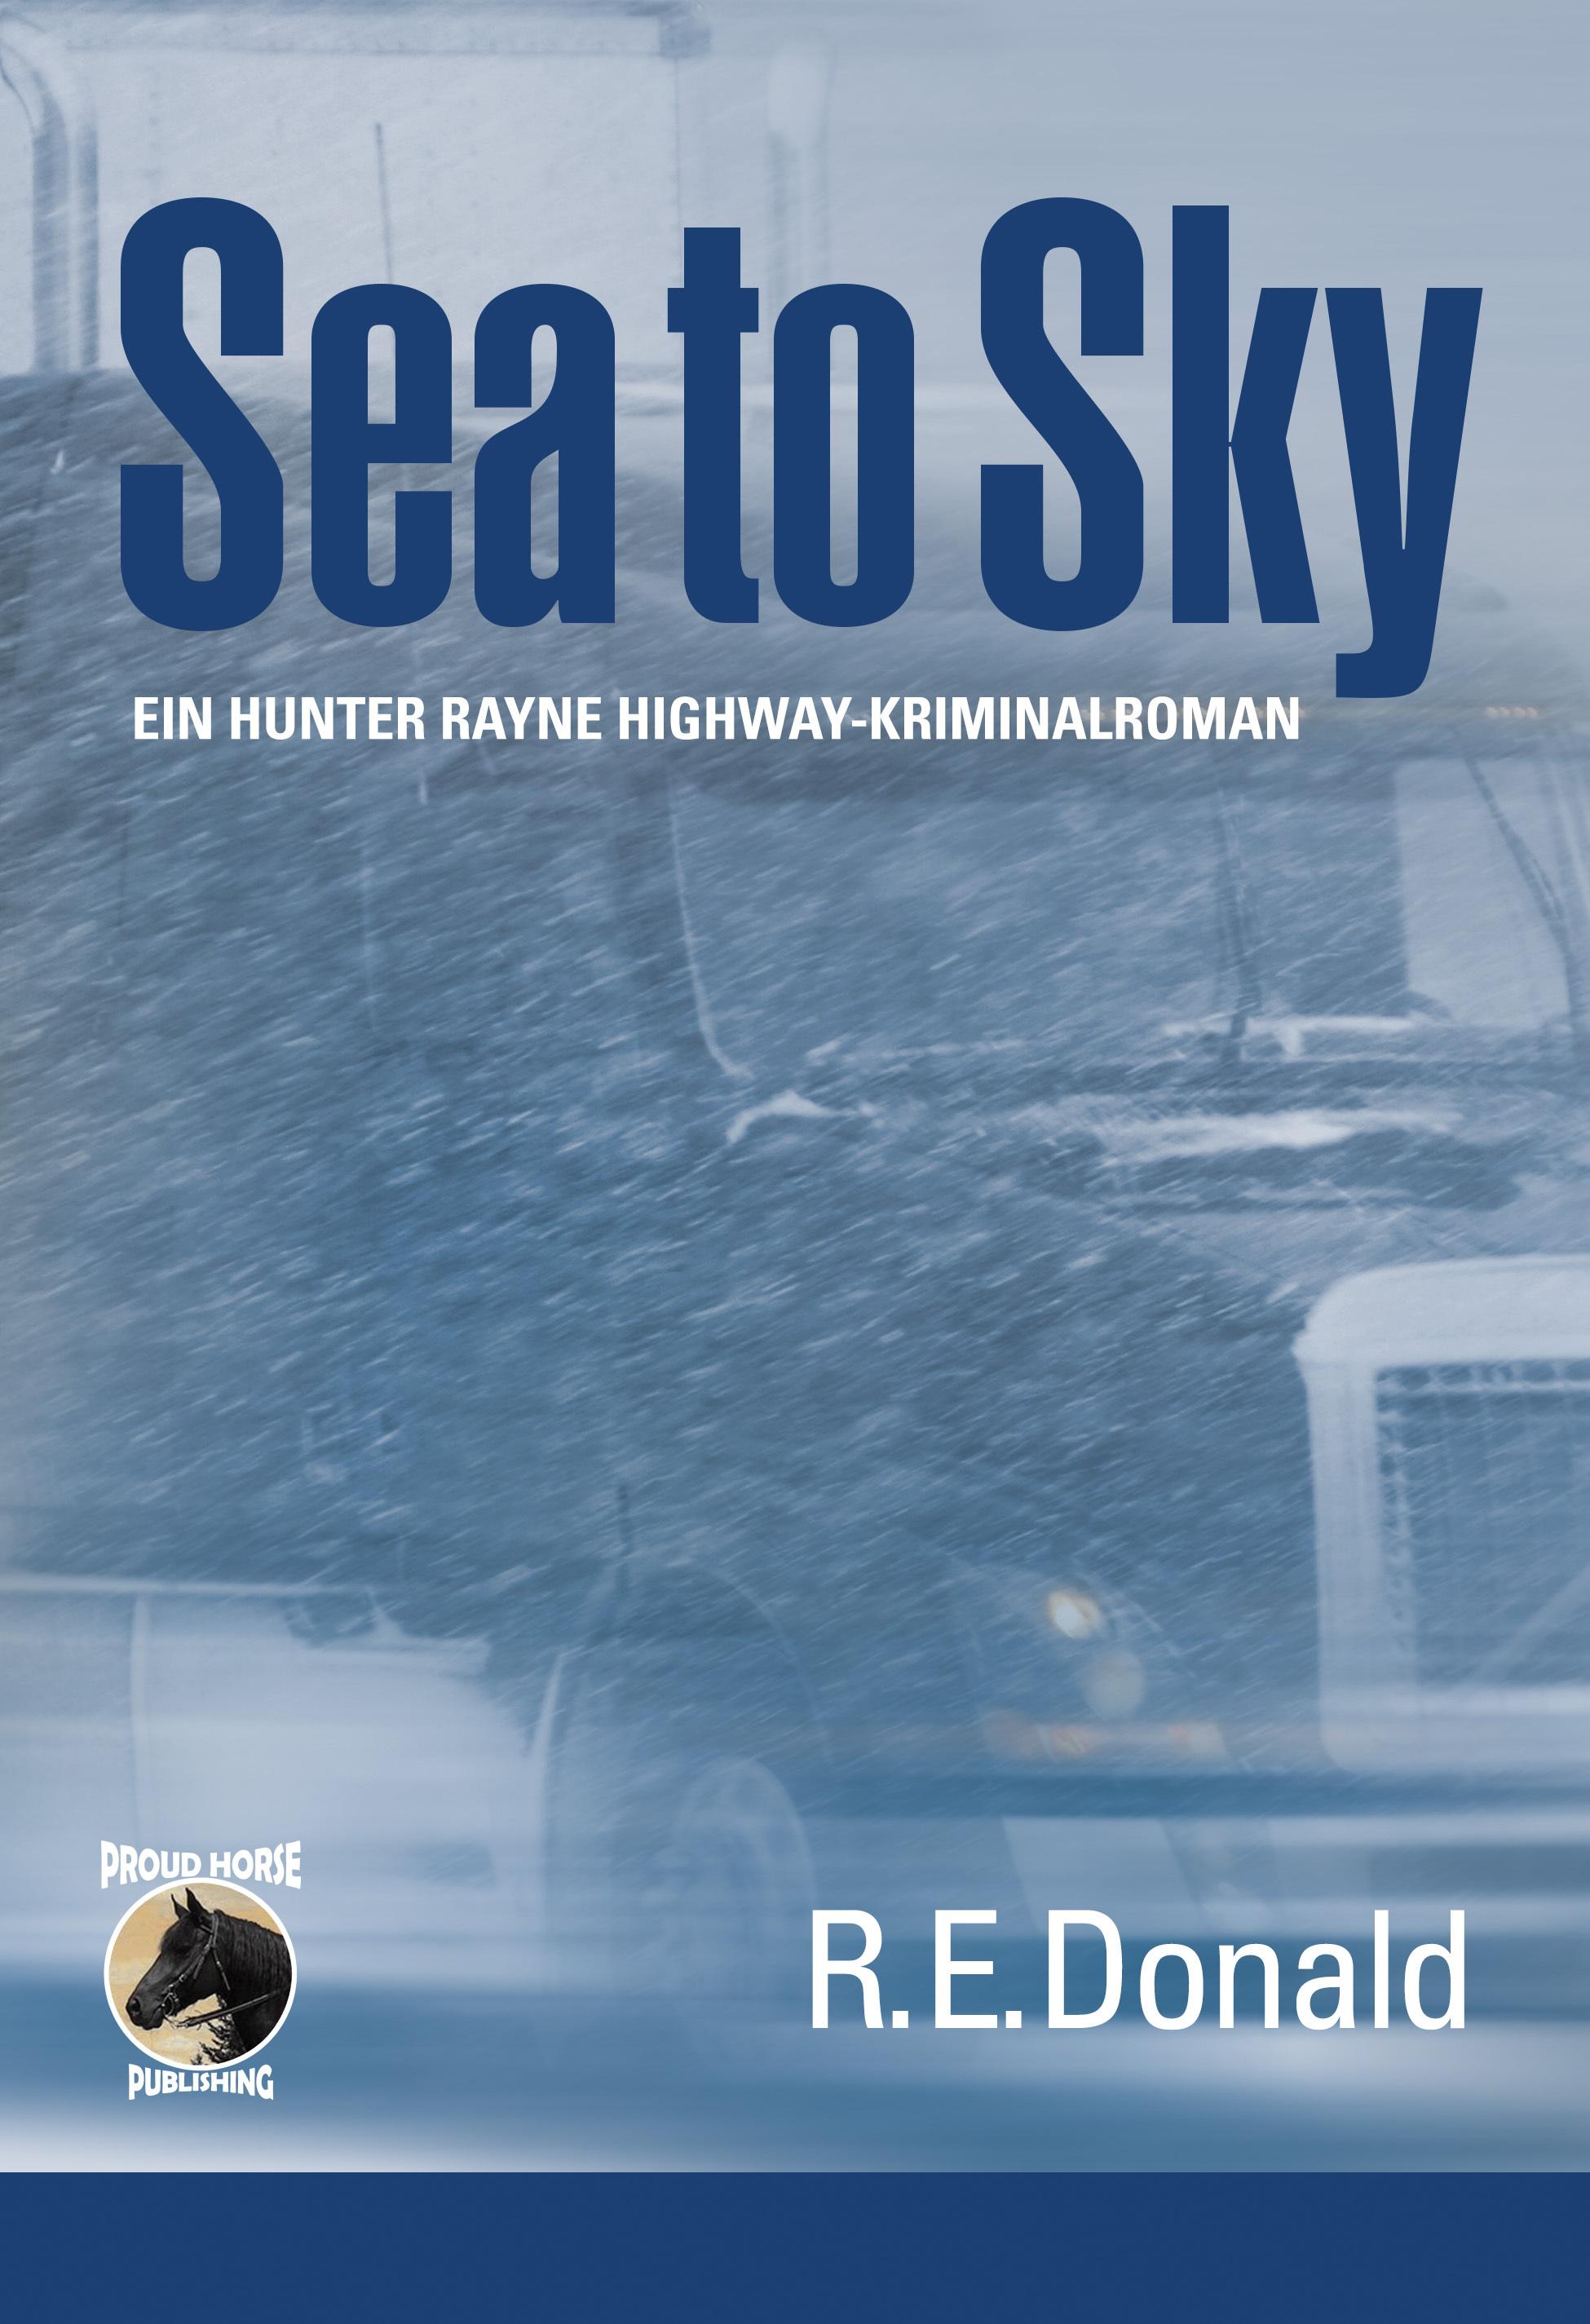 Sea to Sky: Ein Hunter Rayne Highway-Kriminalroman R.E. Donald